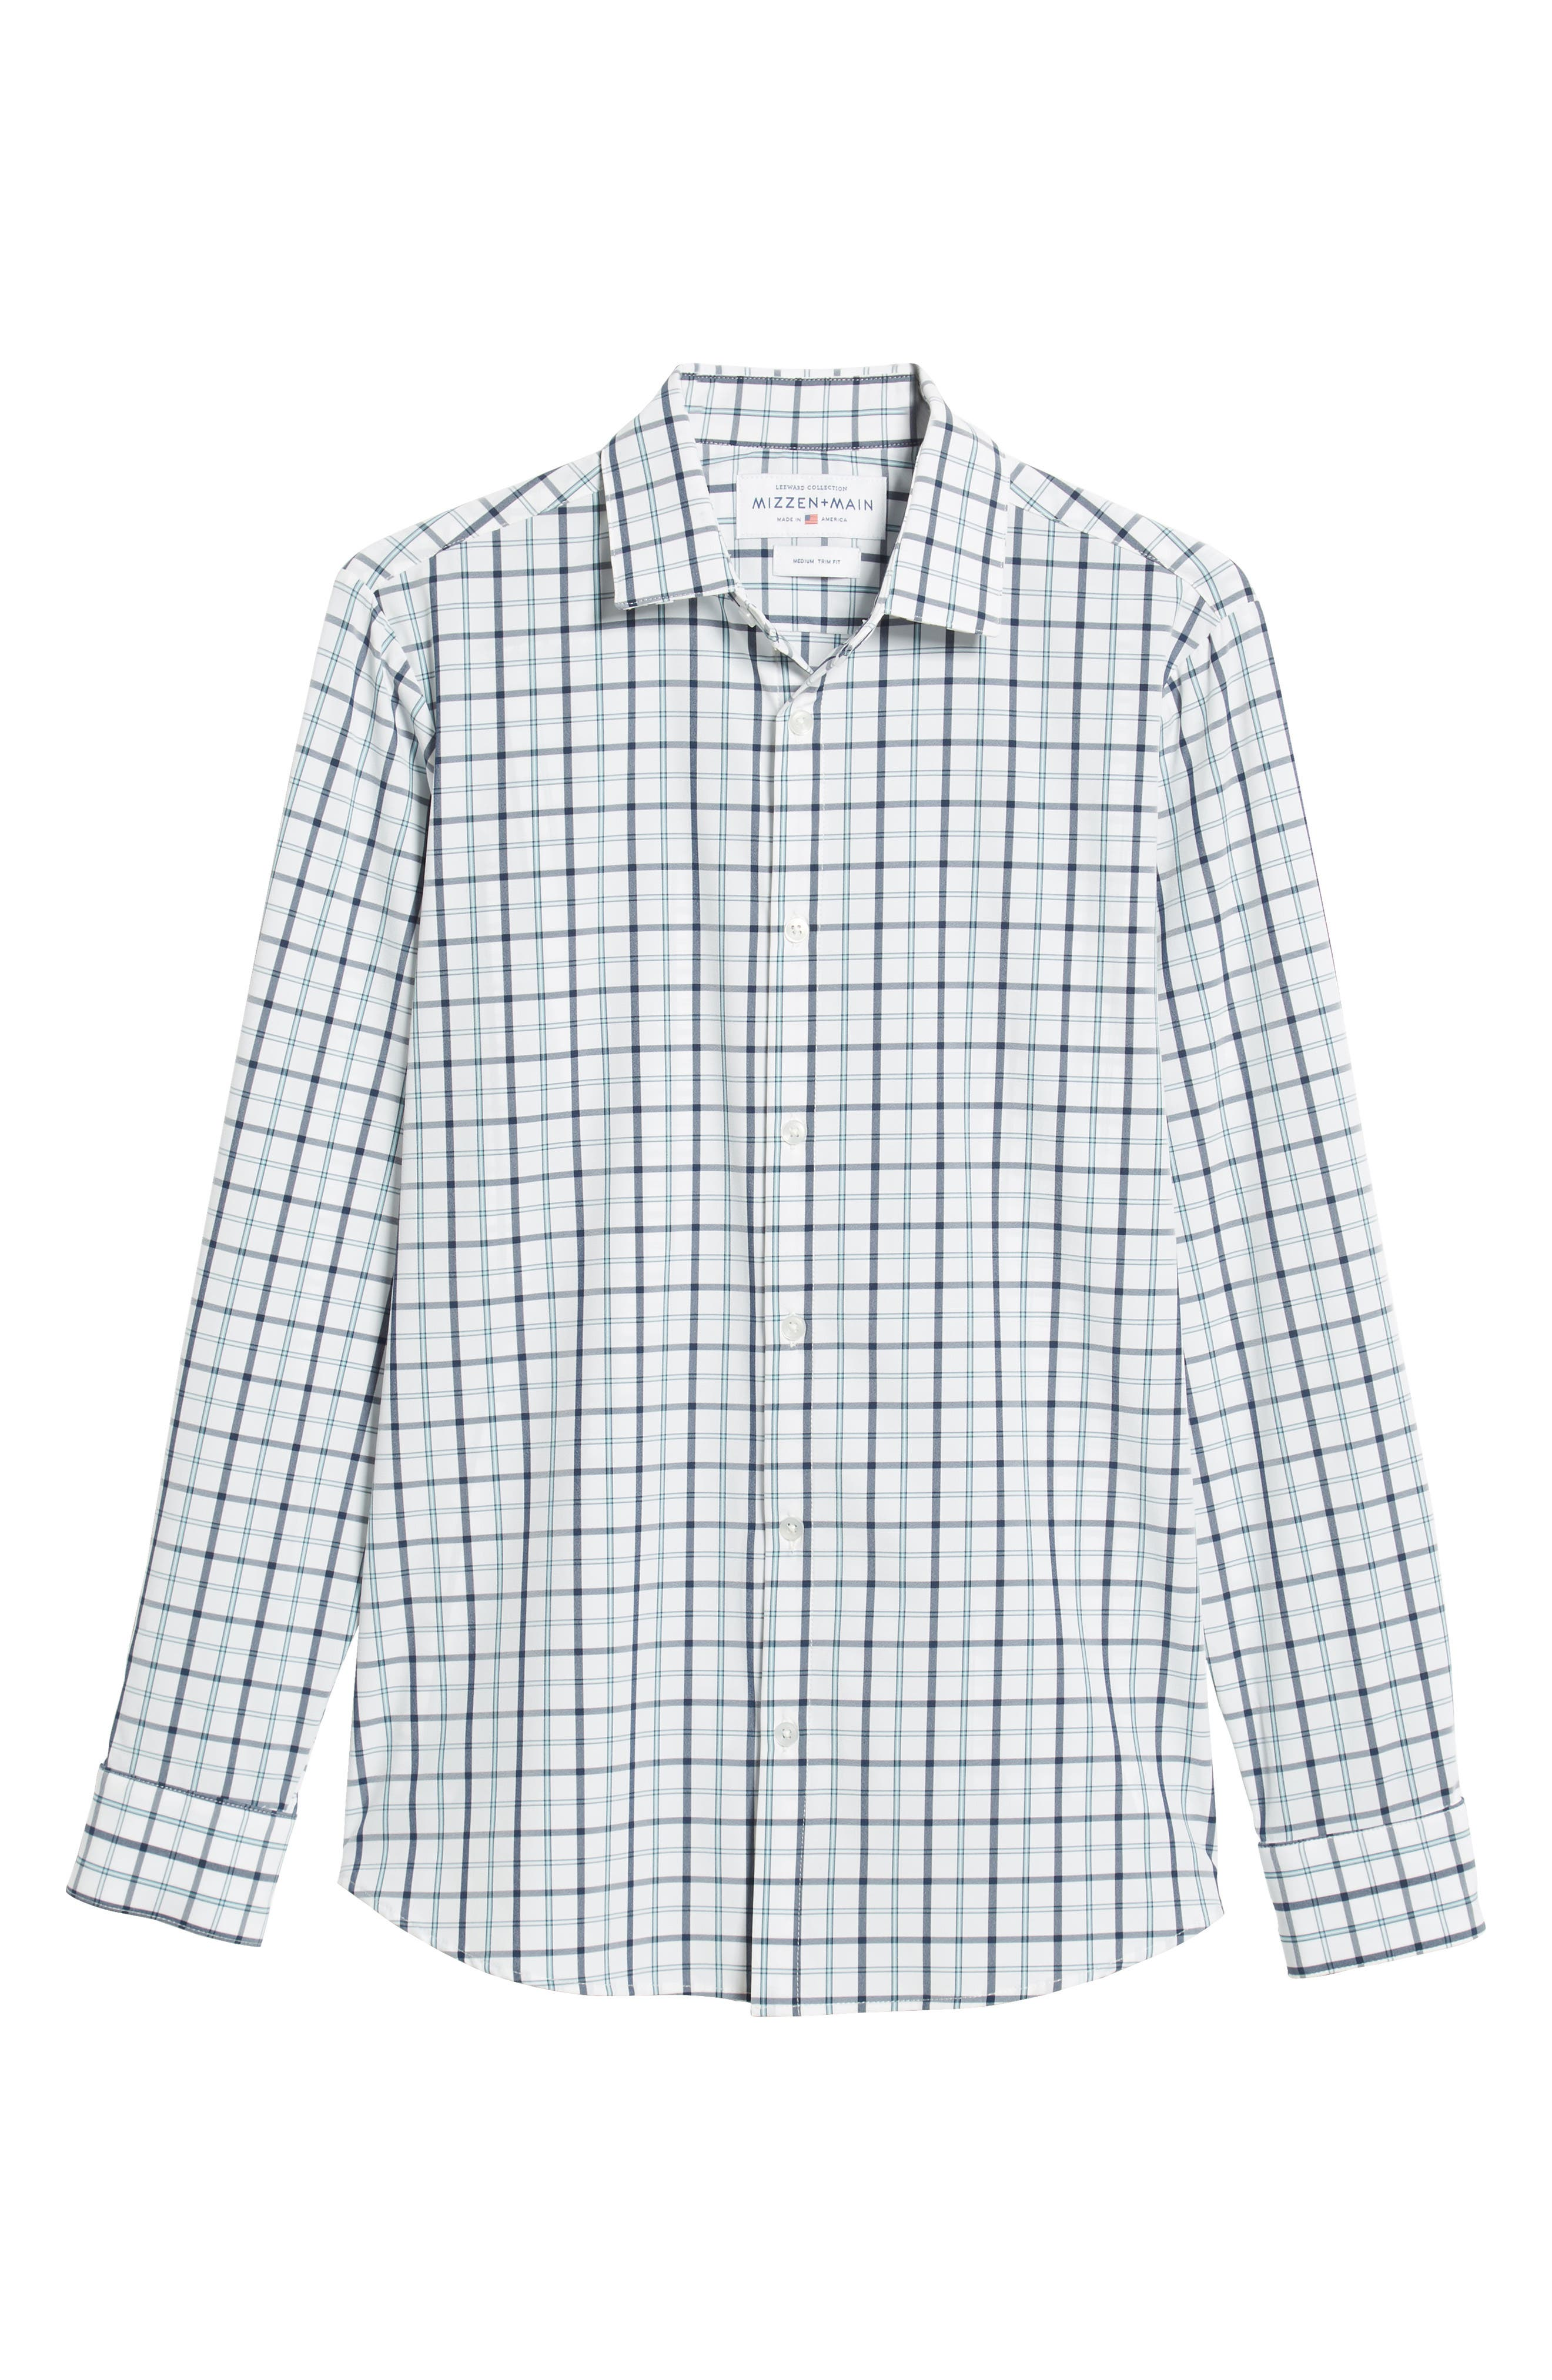 Bowers Regular Fit Check Performance Sport Shirt,                             Alternate thumbnail 5, color,                             NAVY